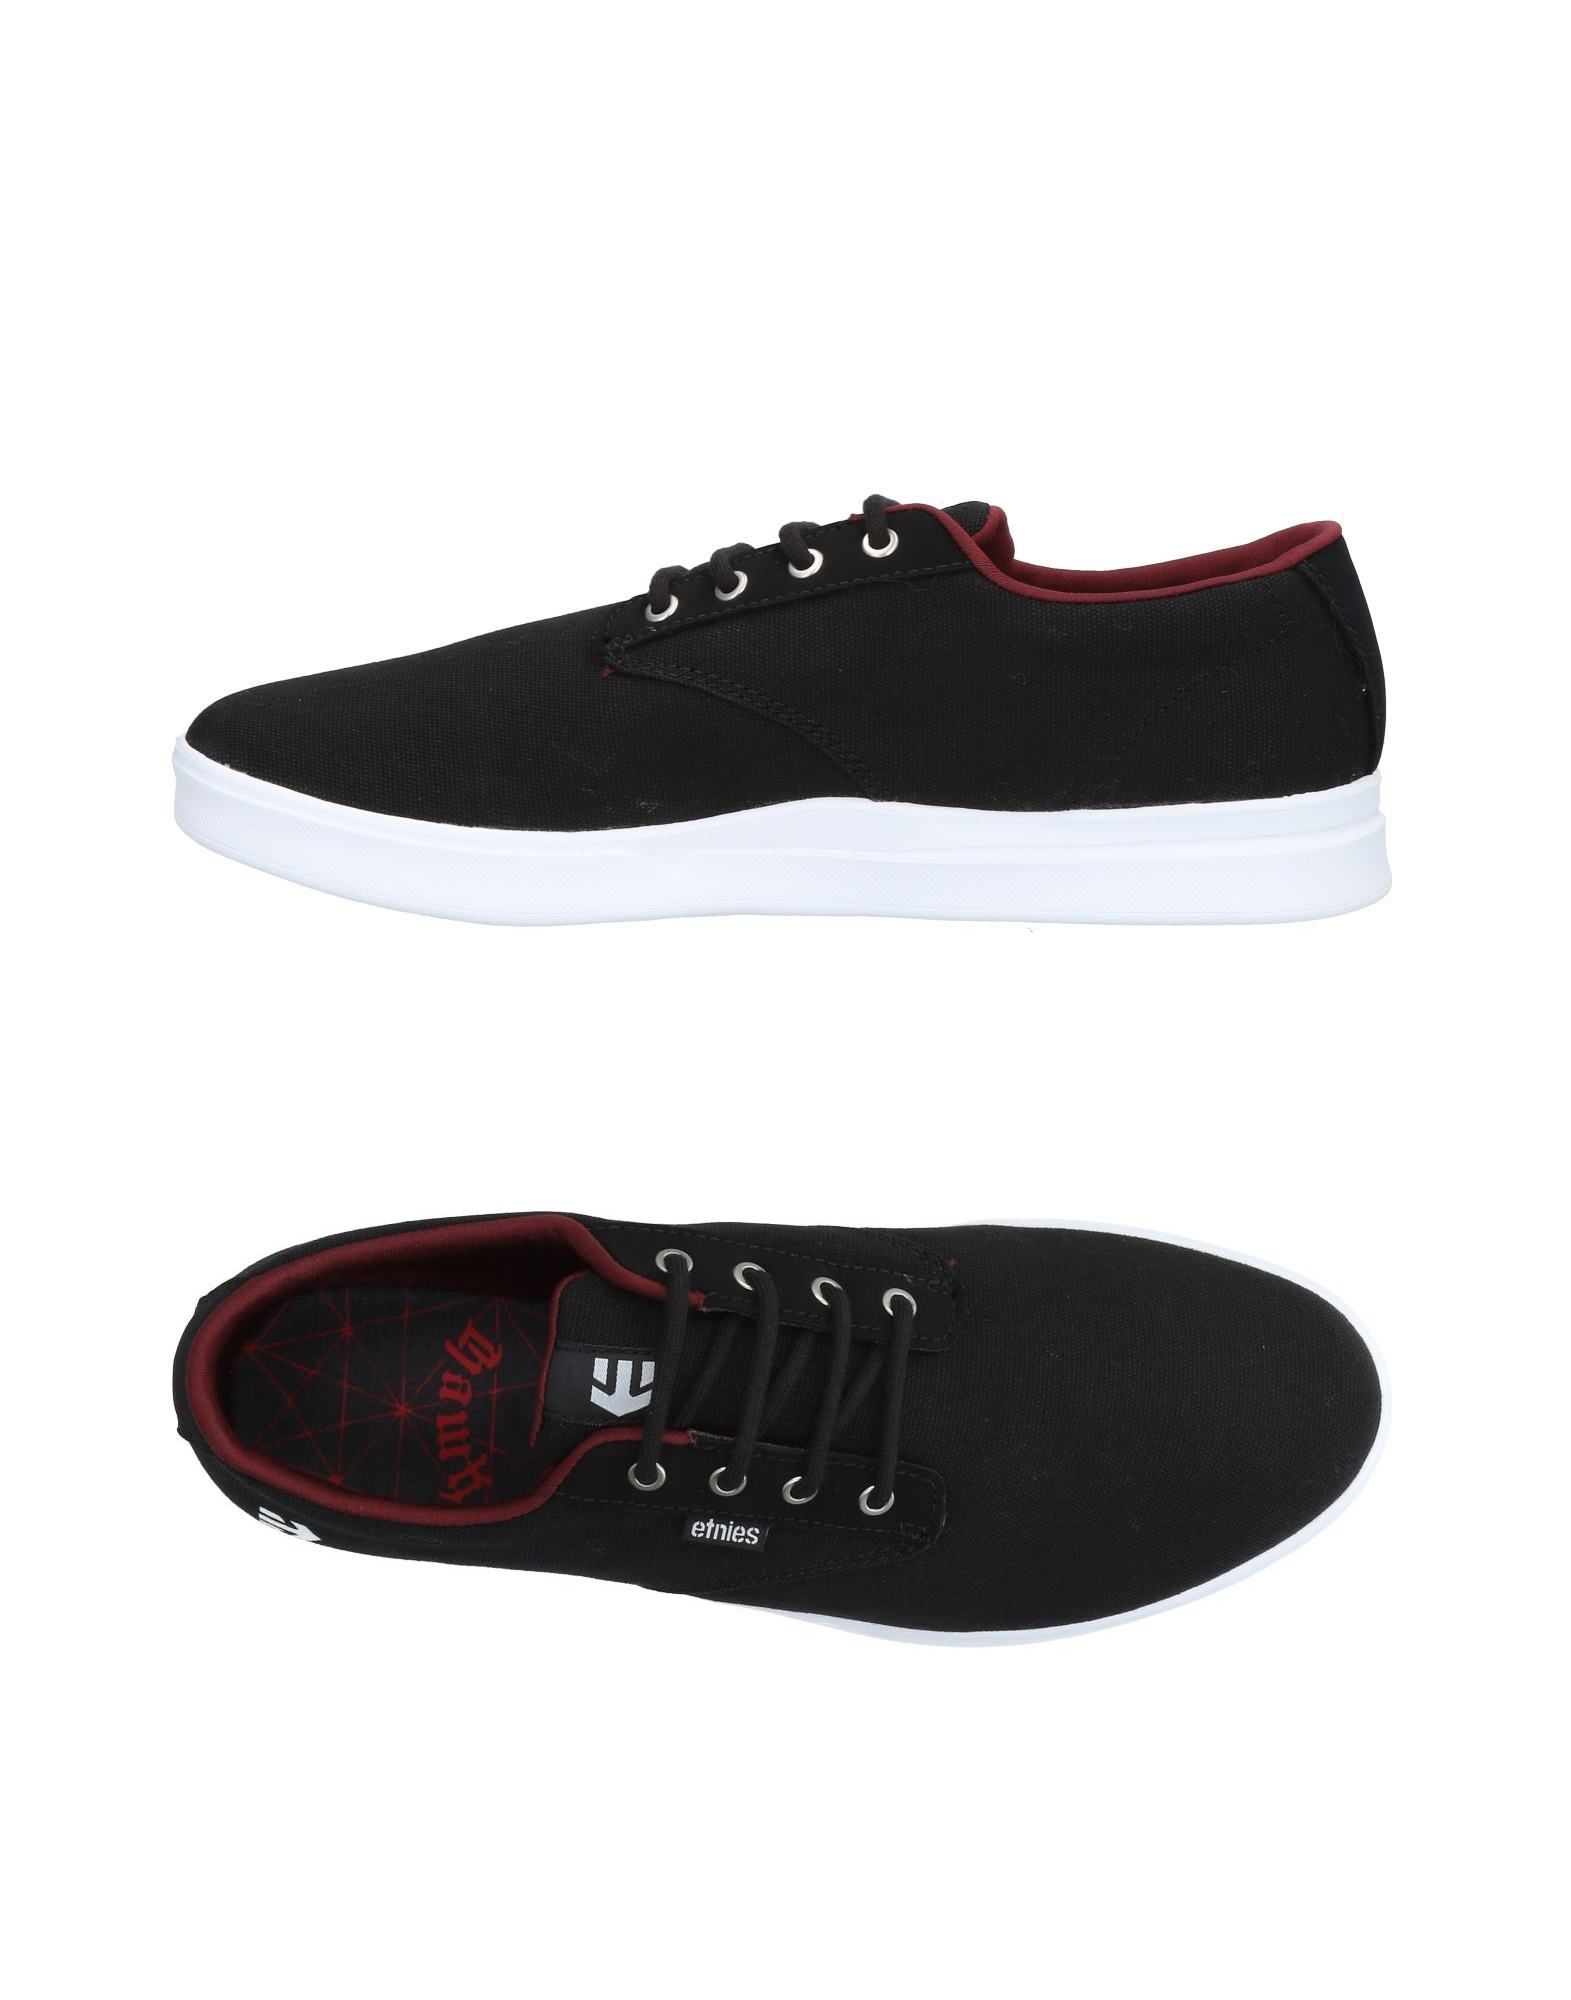 Moda Sneakers Etnies Uomo - 11476474QQ